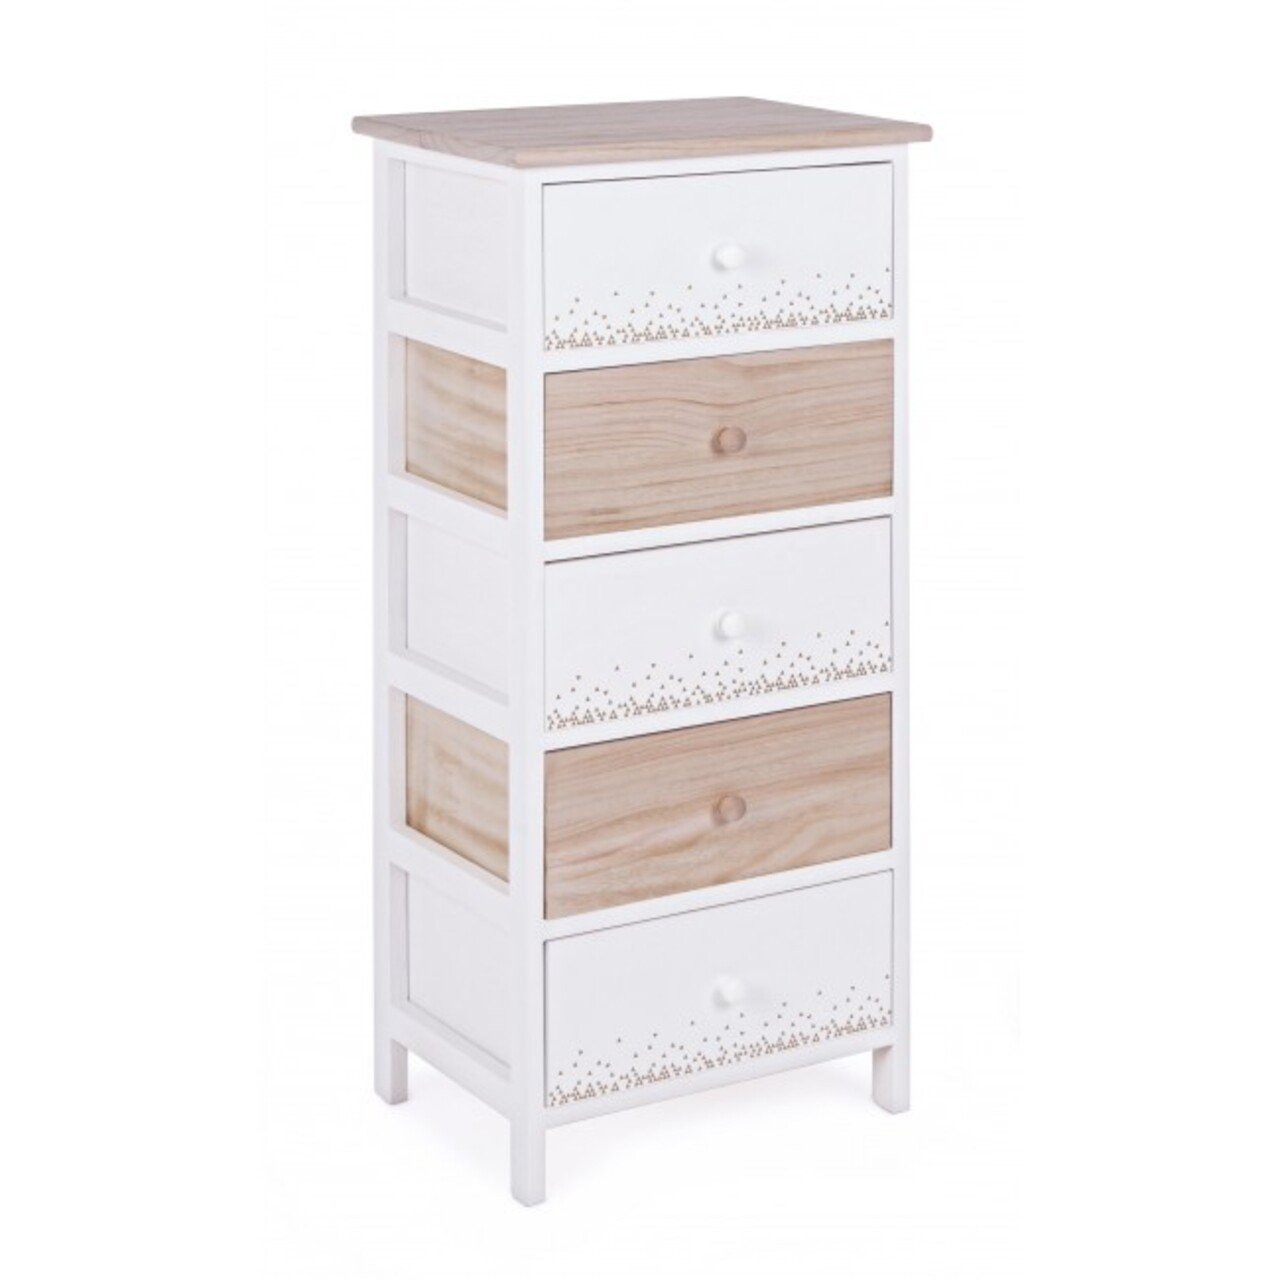 Comoda cu 5 sertare, Ally, Bizzotto, 40x29x90 cm, lemn de paulownia, alb/natural